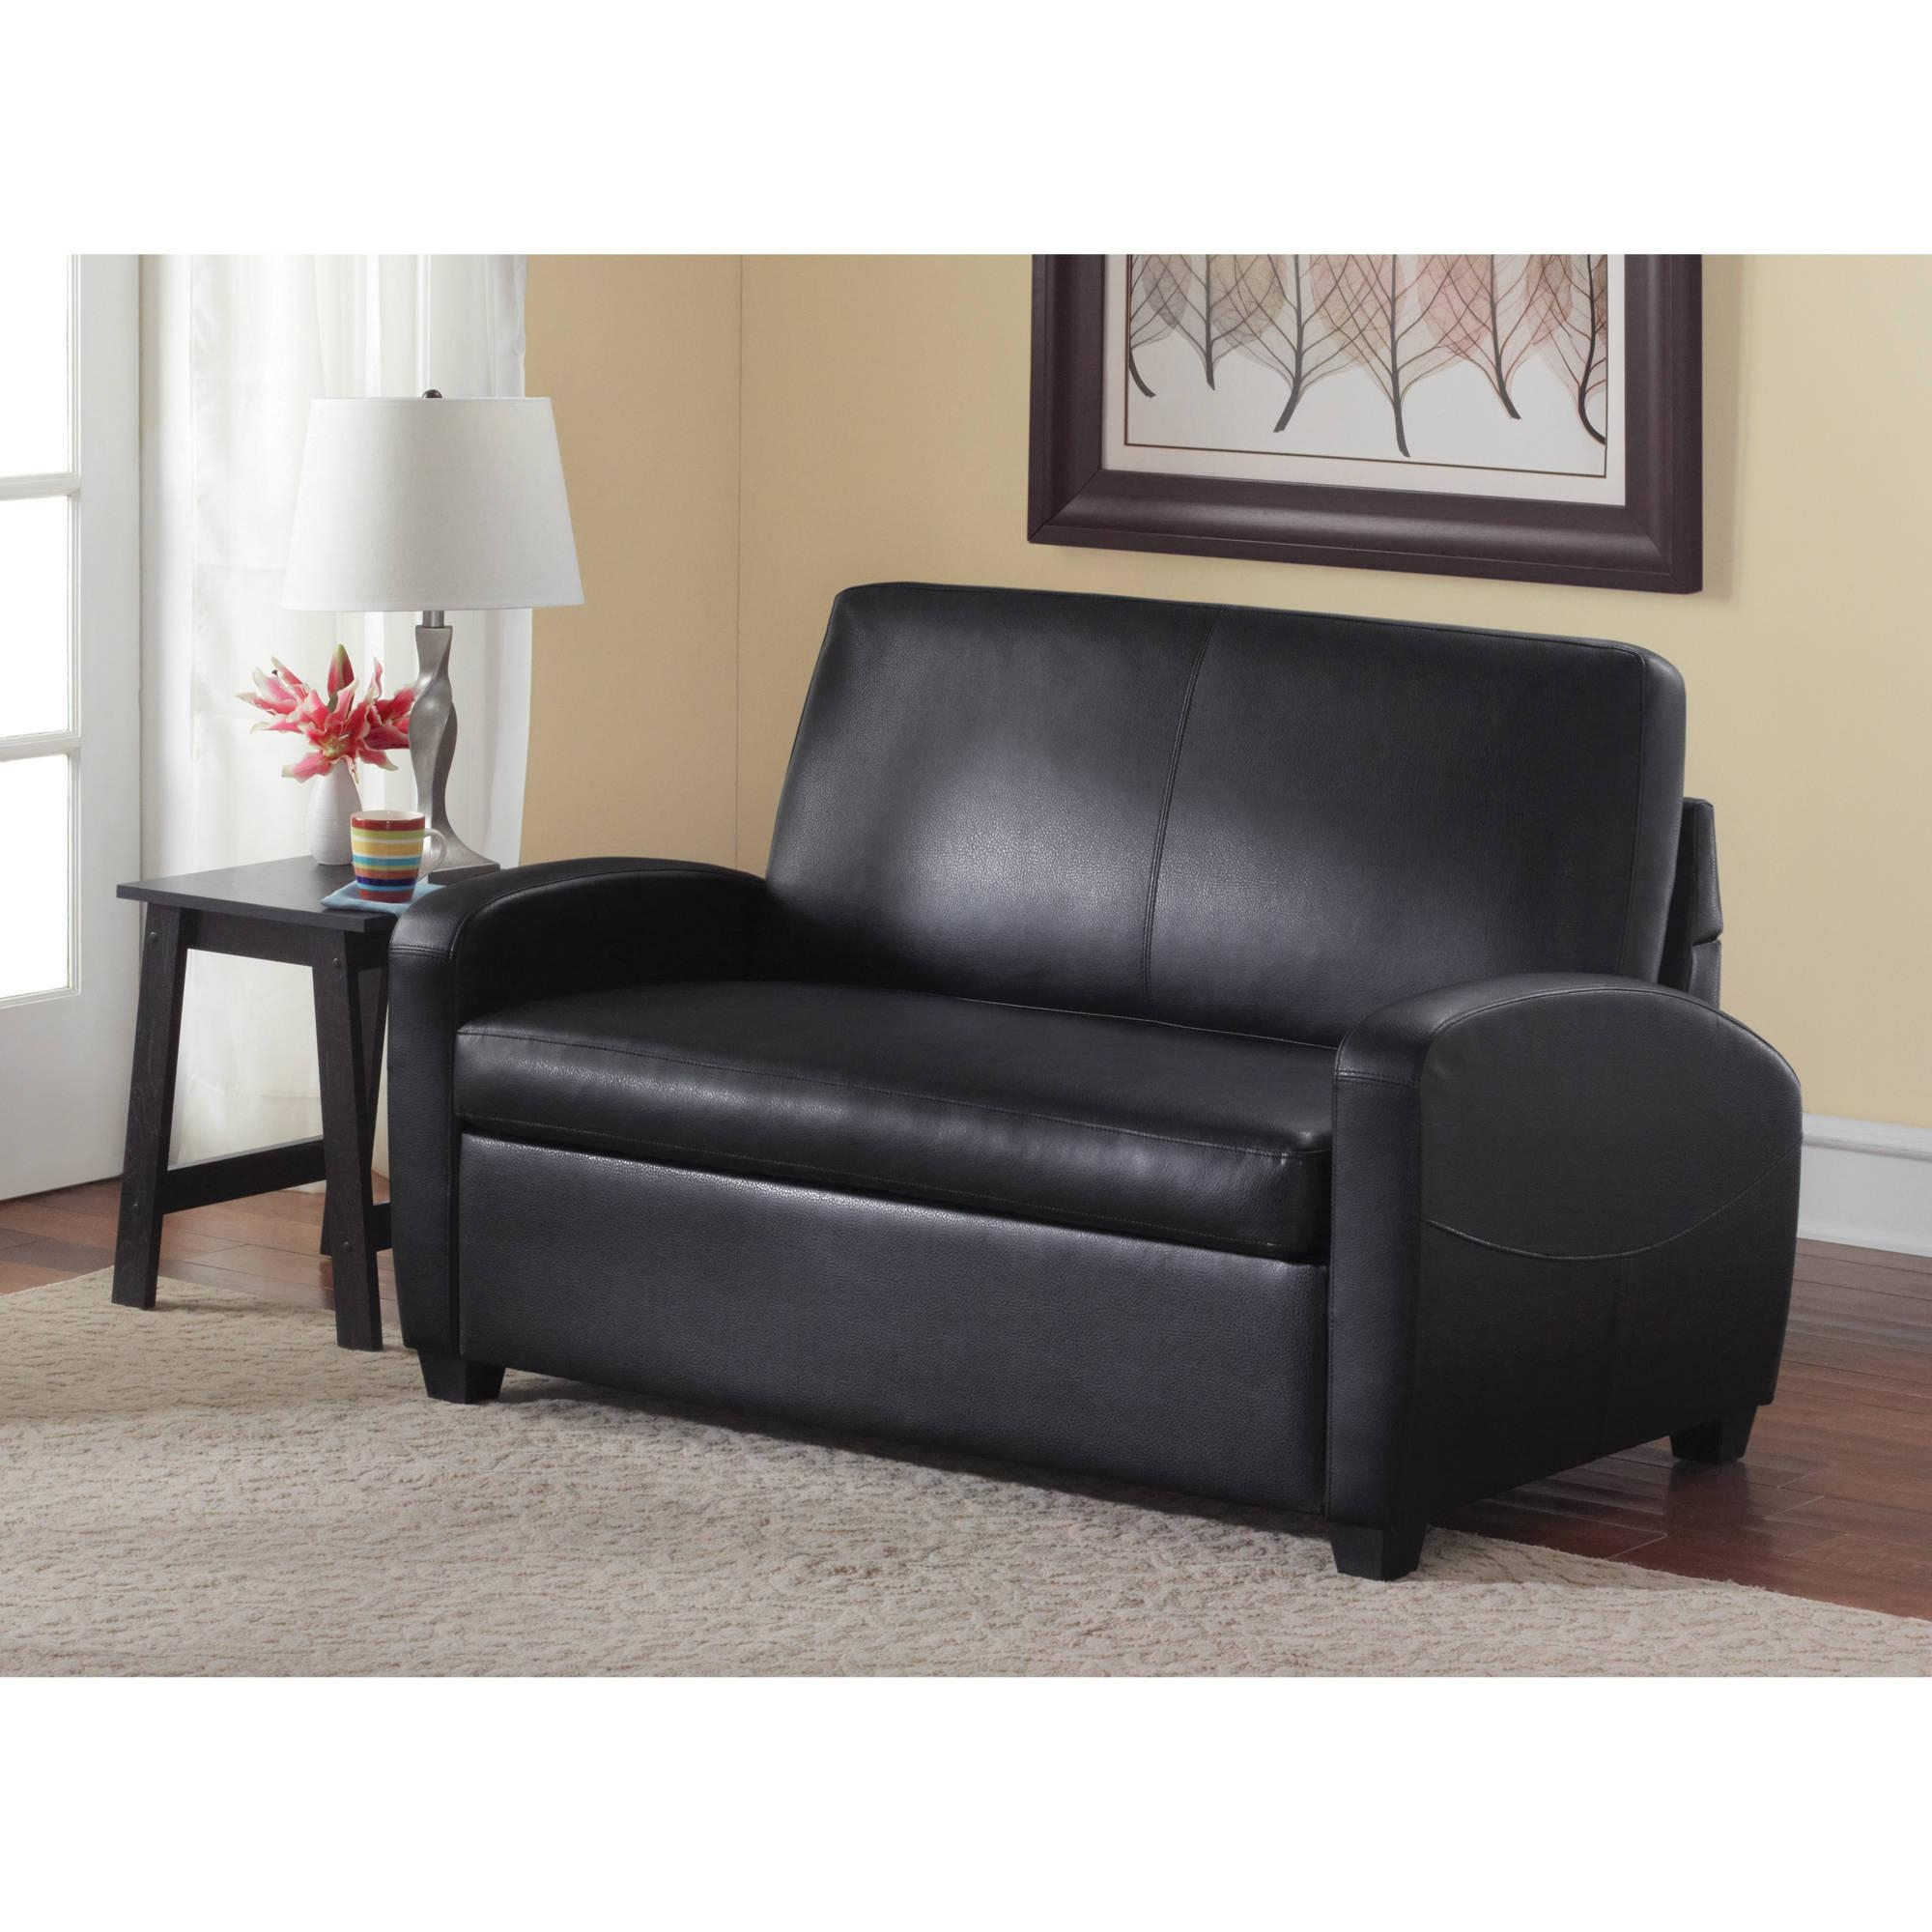 Sofa: Cheap Futon Beds | Convertible Sofa Bed | Walmart Sofa Bed Pertaining To Cheap Sofa Beds (View 9 of 20)